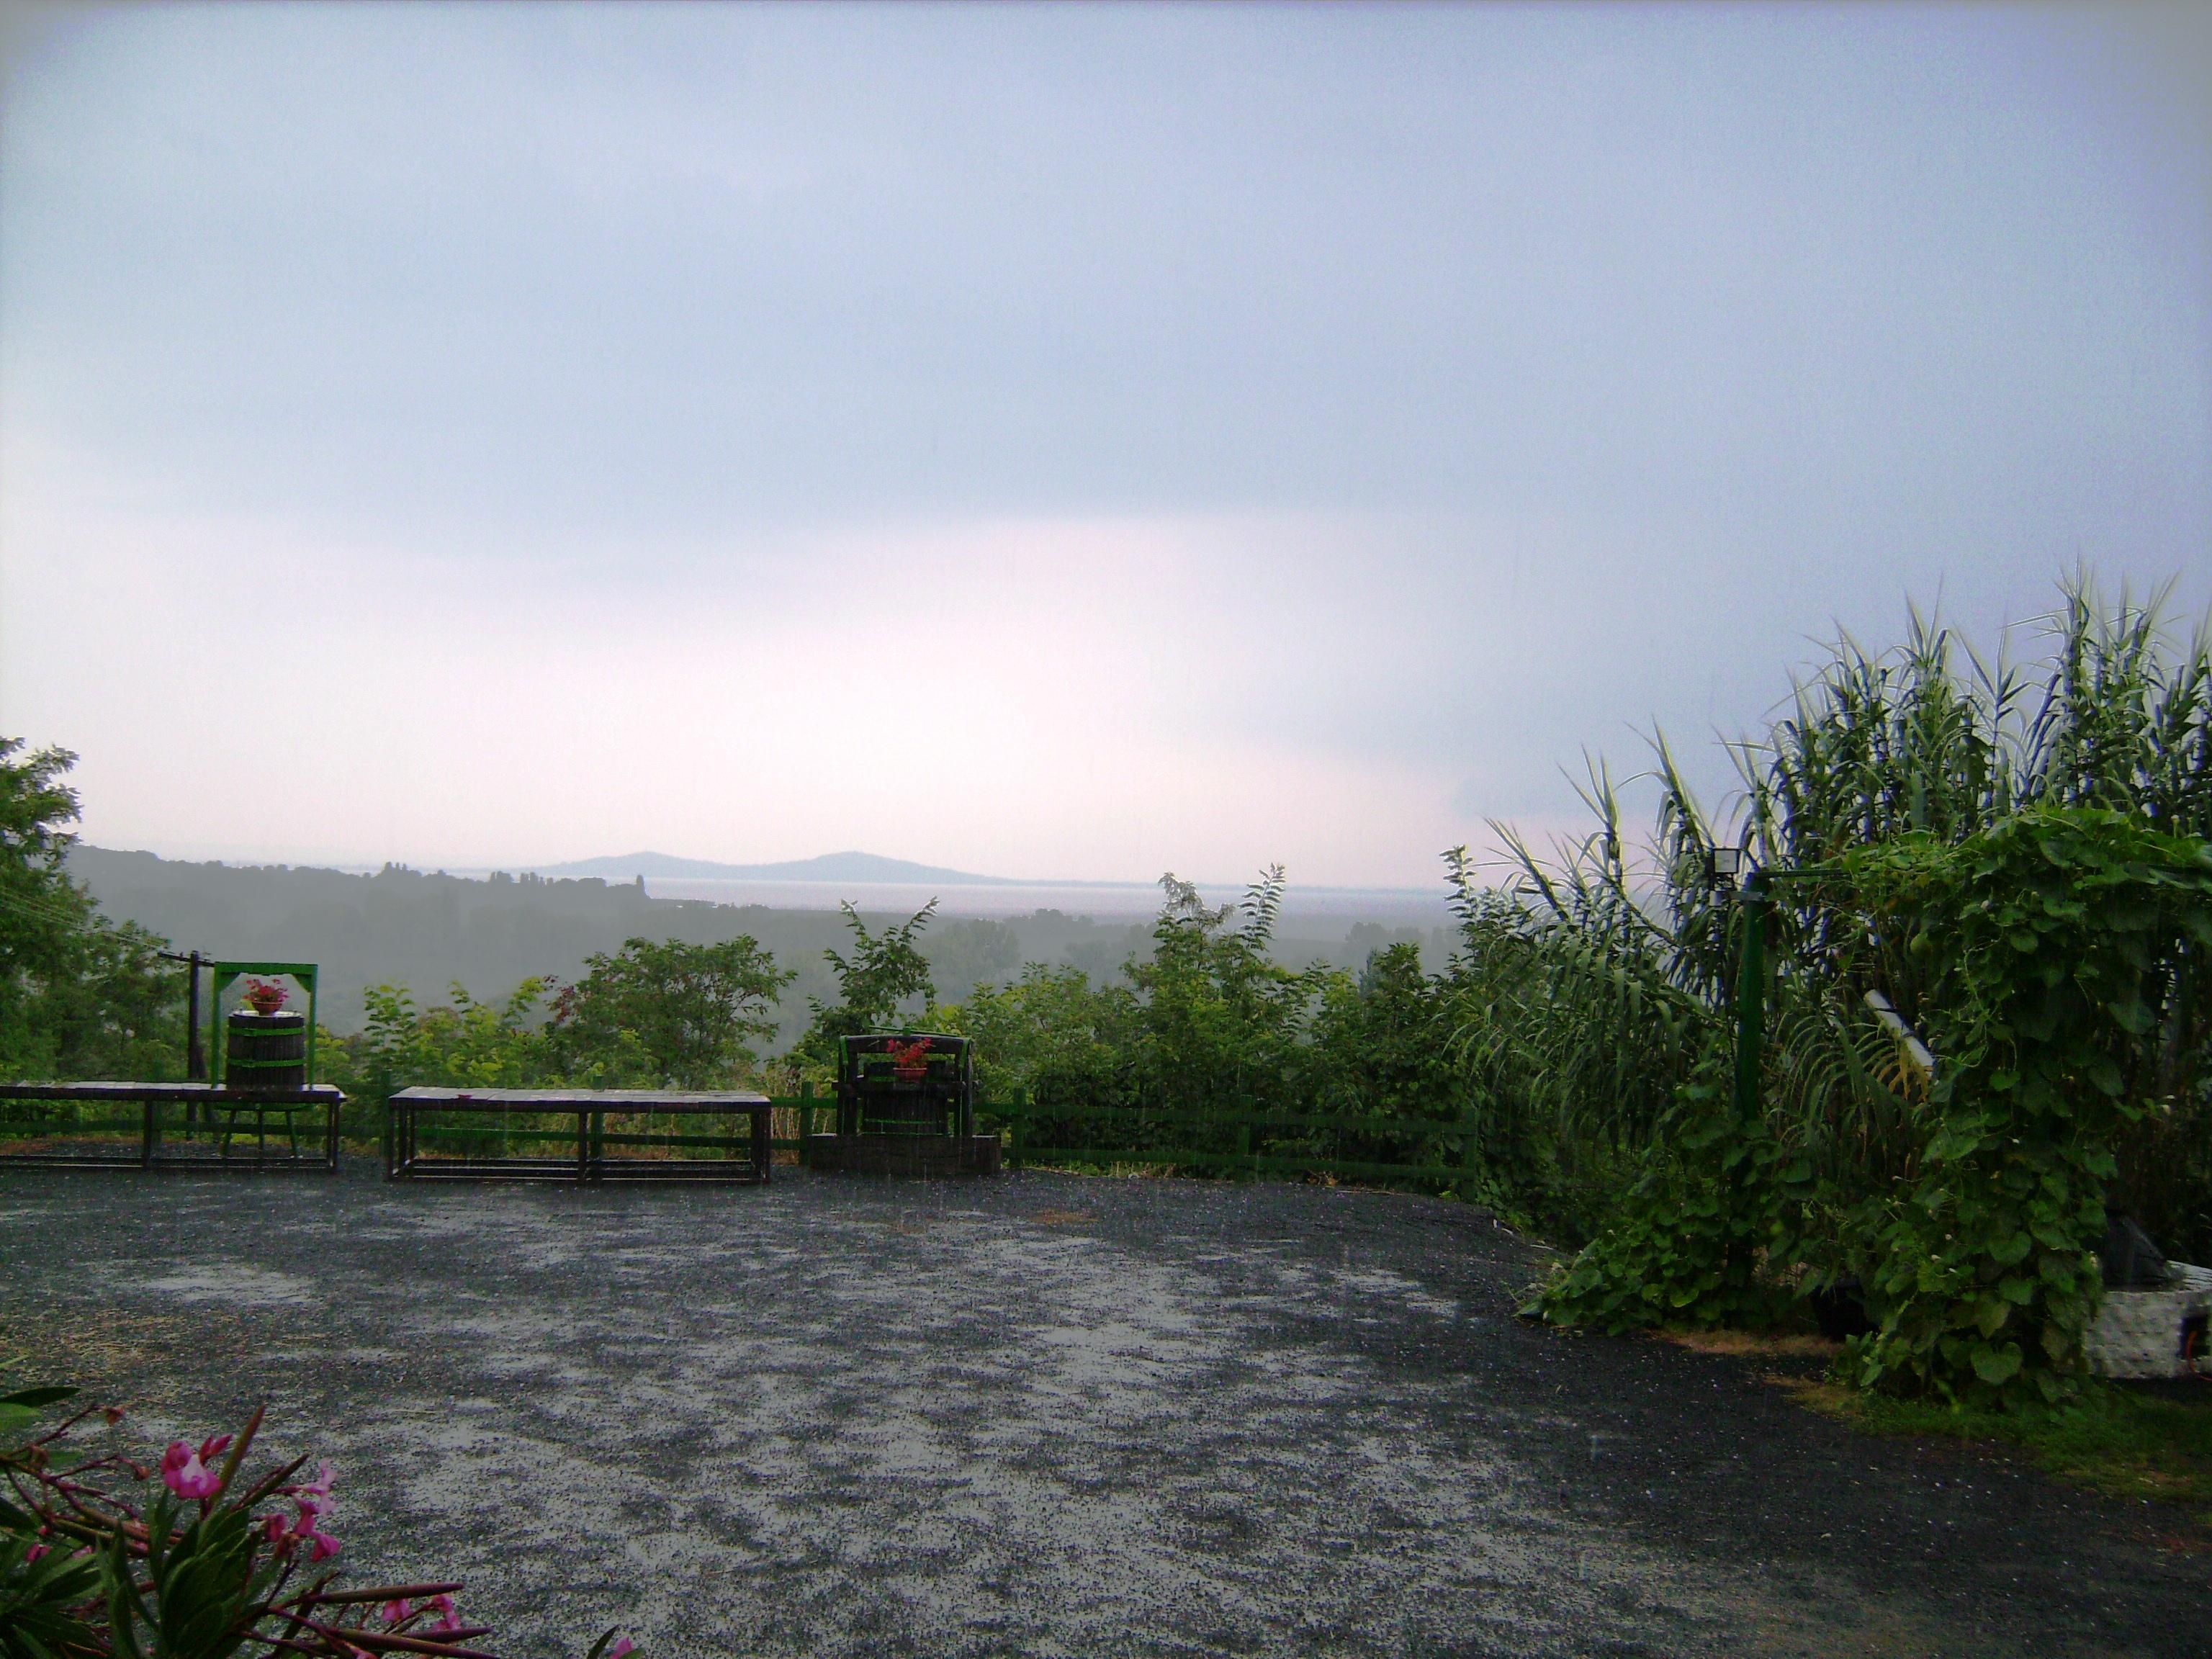 2_vihar1.JPG